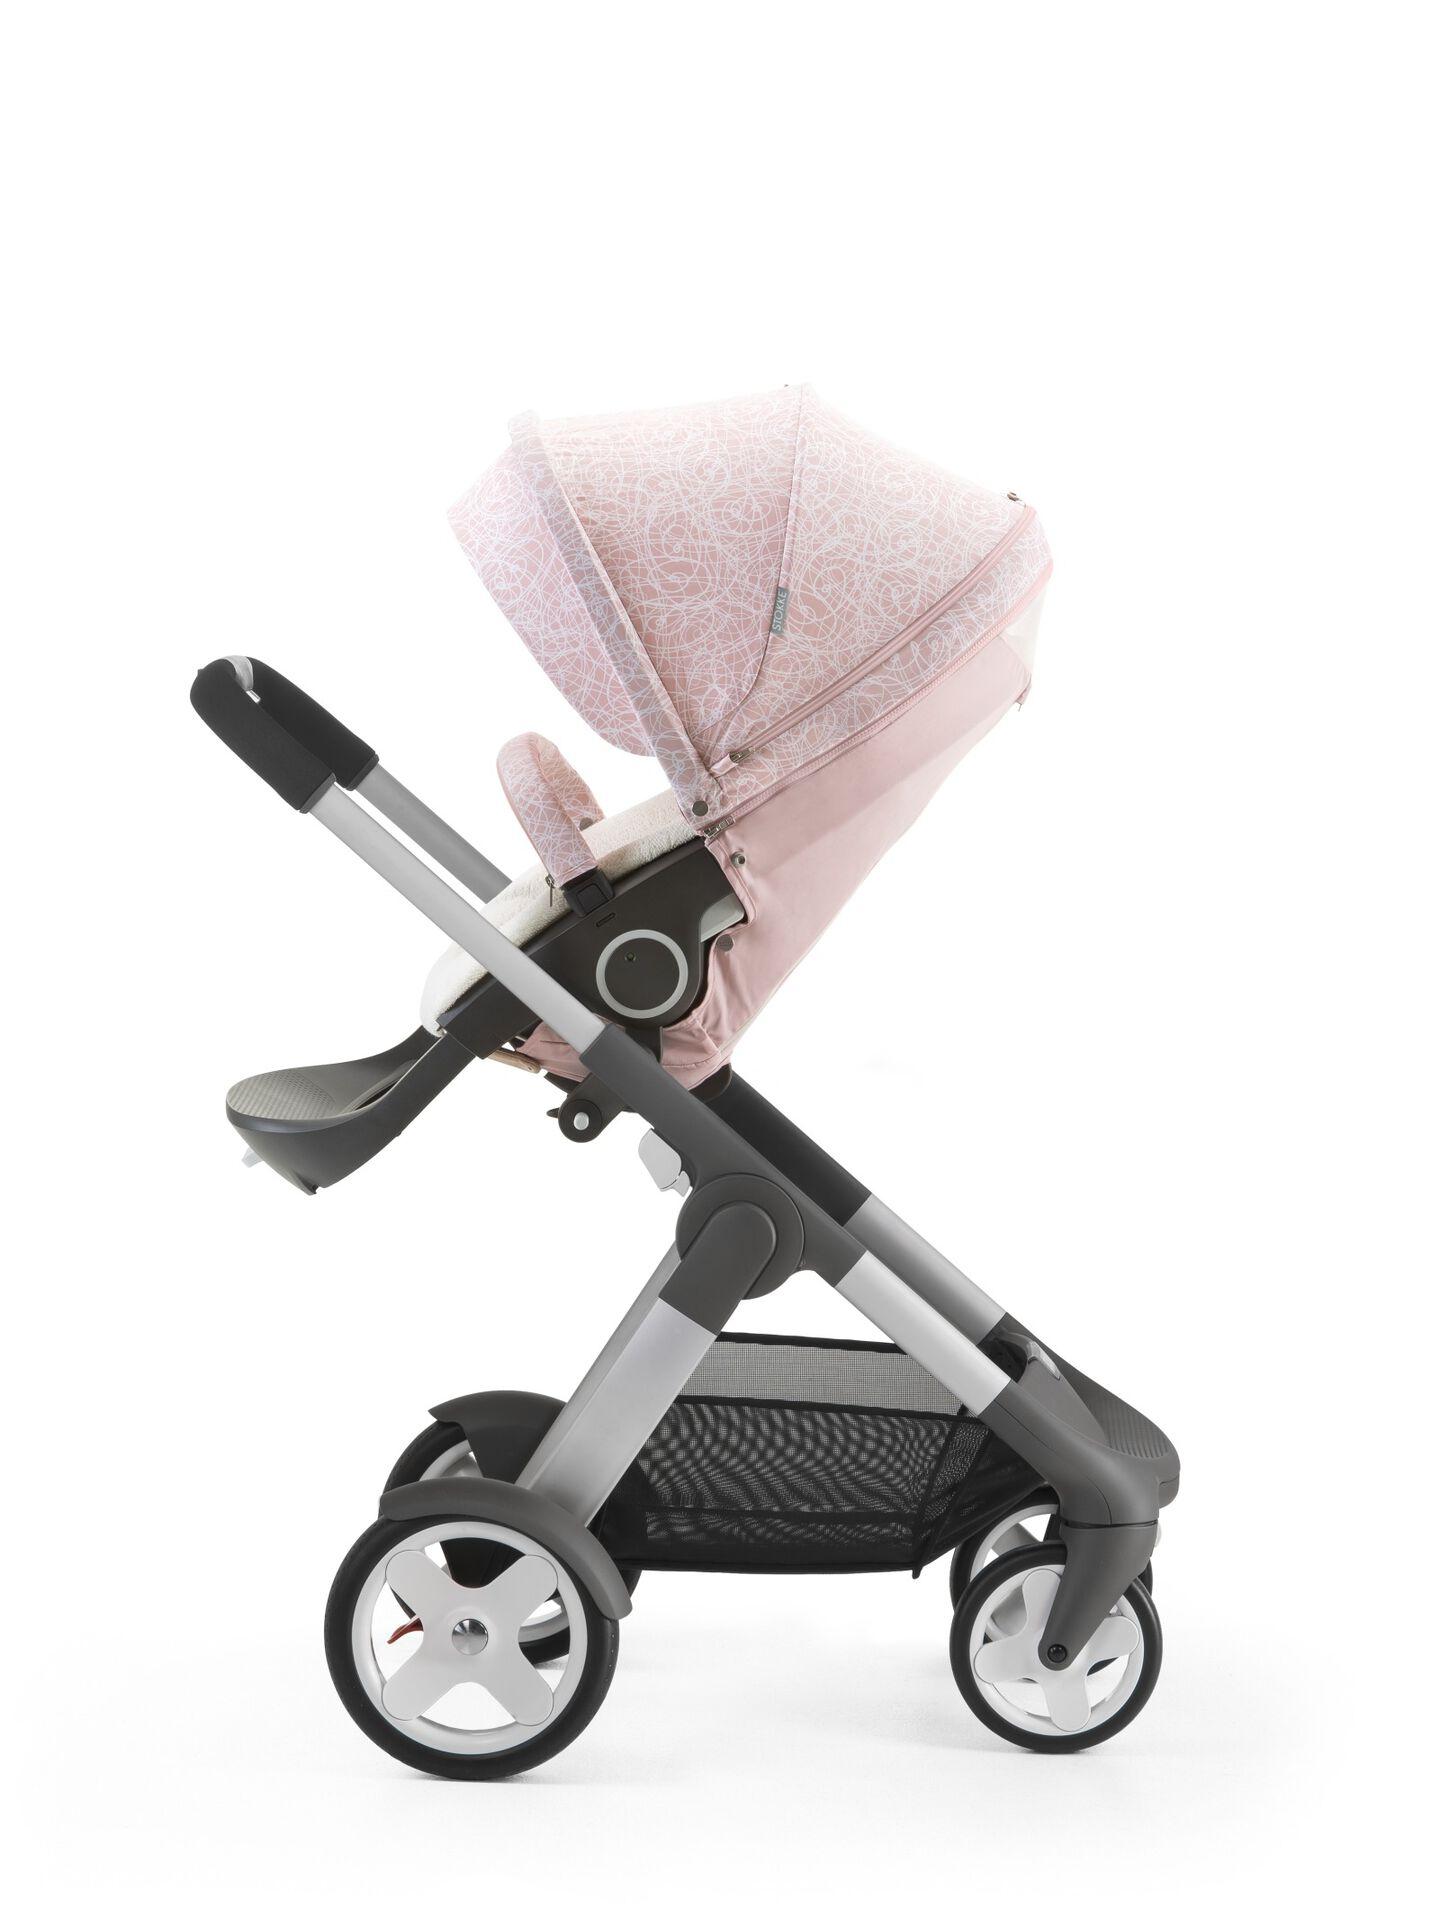 Stokke® Crusi™ with Stokke® Stroller Summer Kit Scribble Salty Blue.